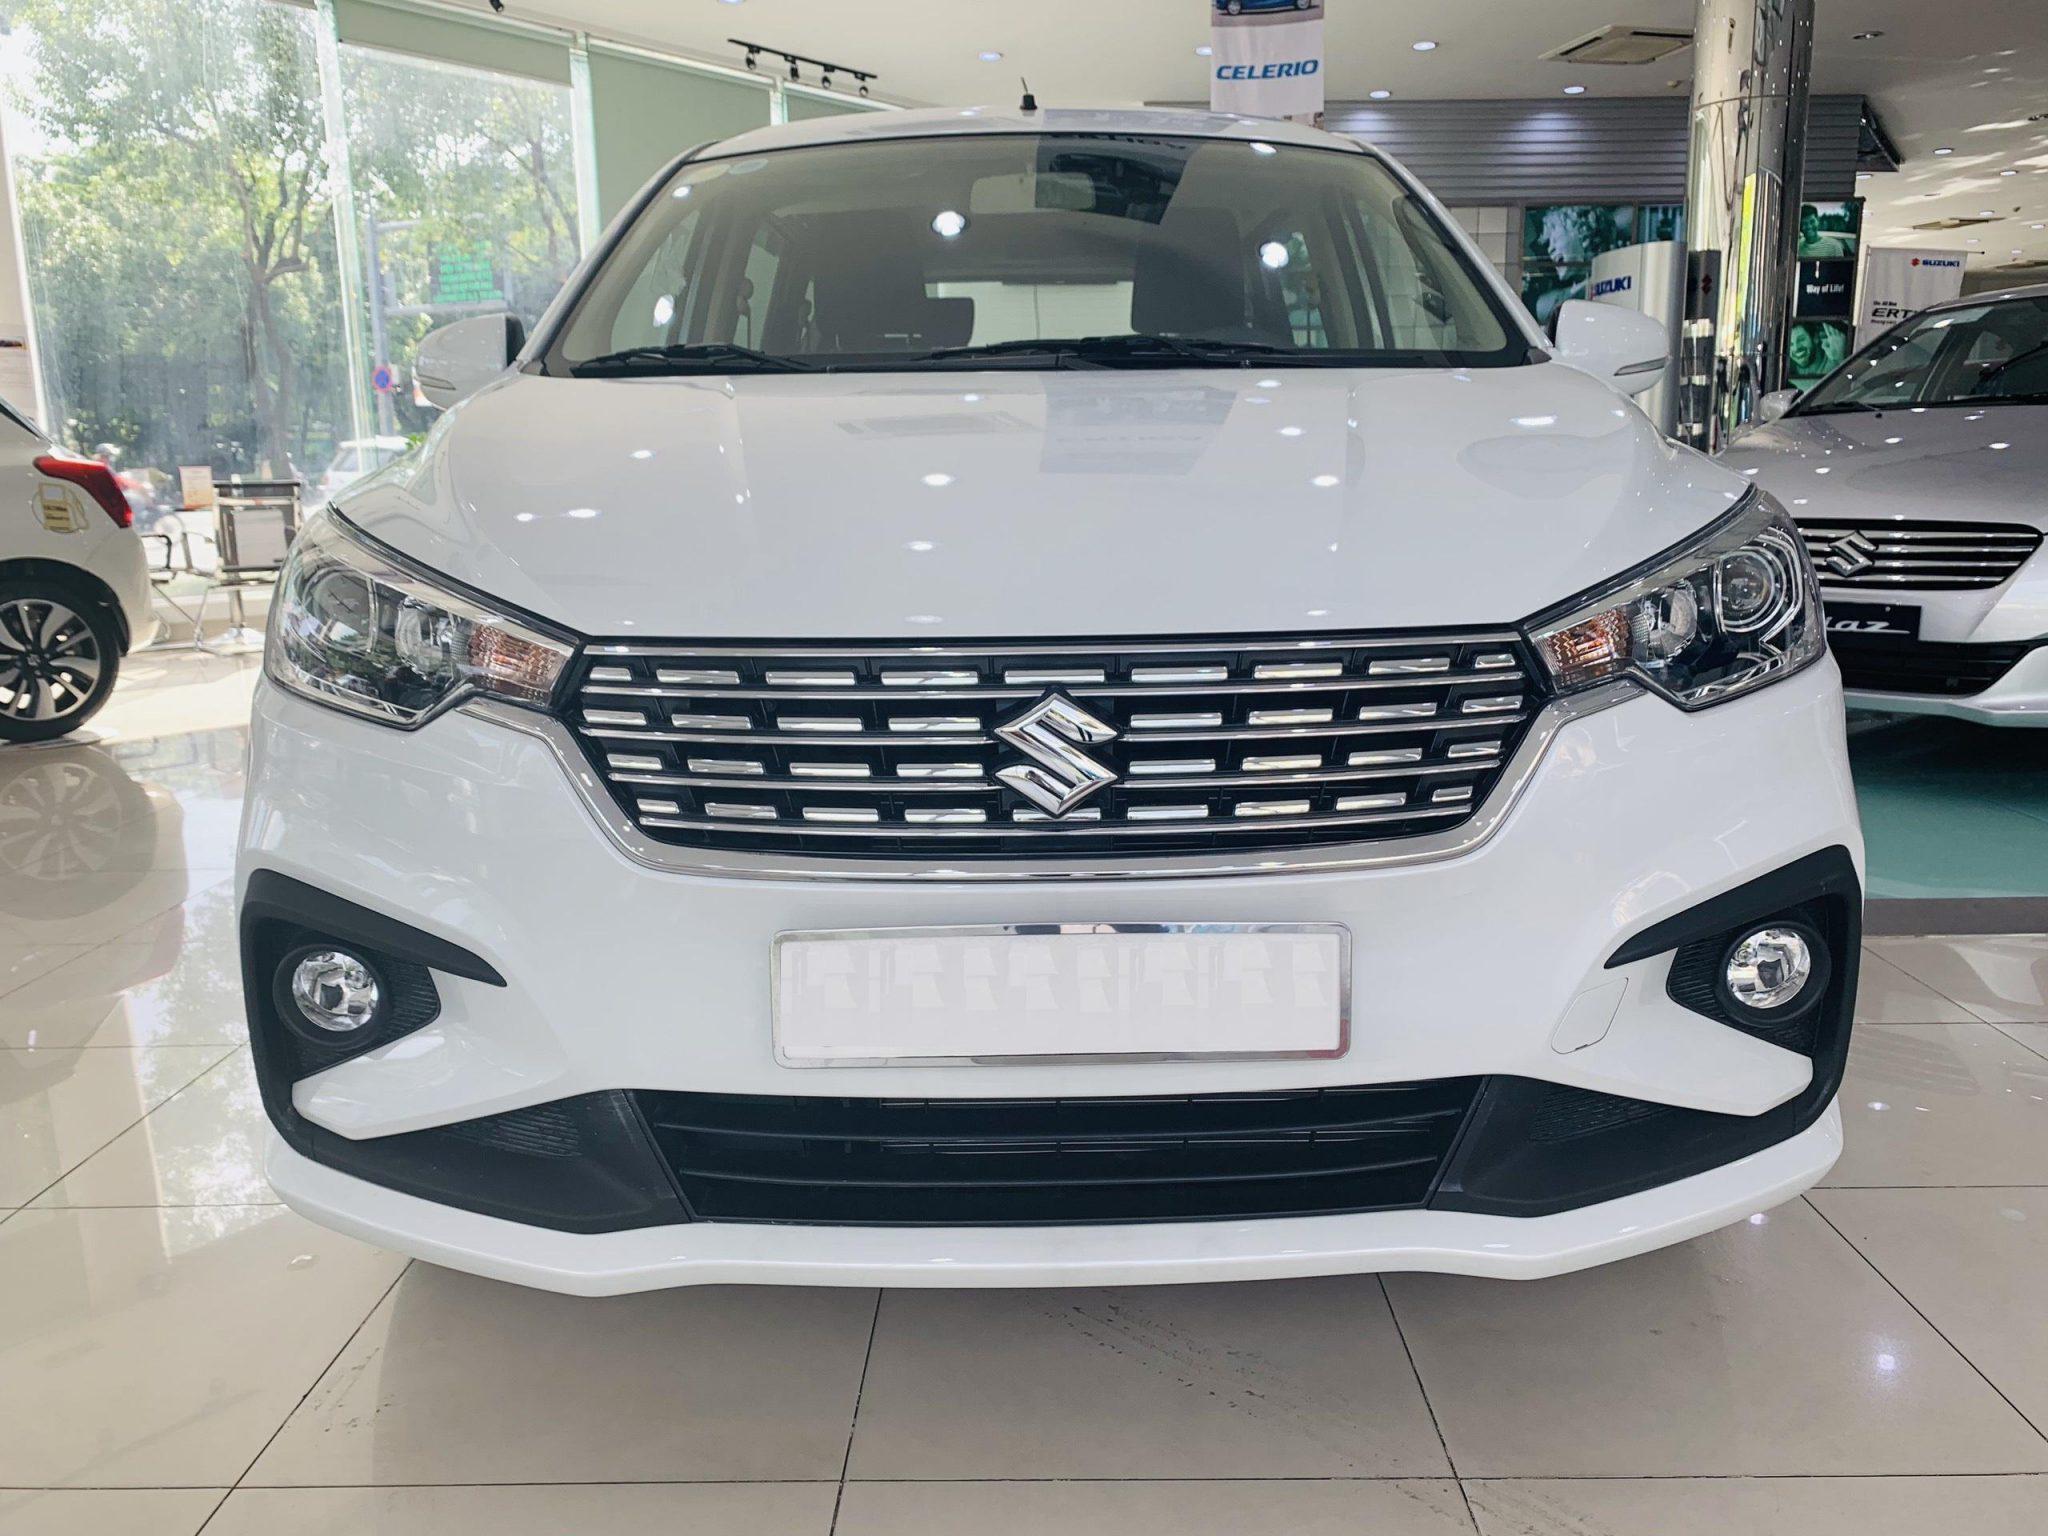 xe Suzuki Ertiga 2019 tai muaxegiabeo 7 - Suzuki Ertiga [hienthinam]: giá xe và khuyến mãi tháng [hienthithang]